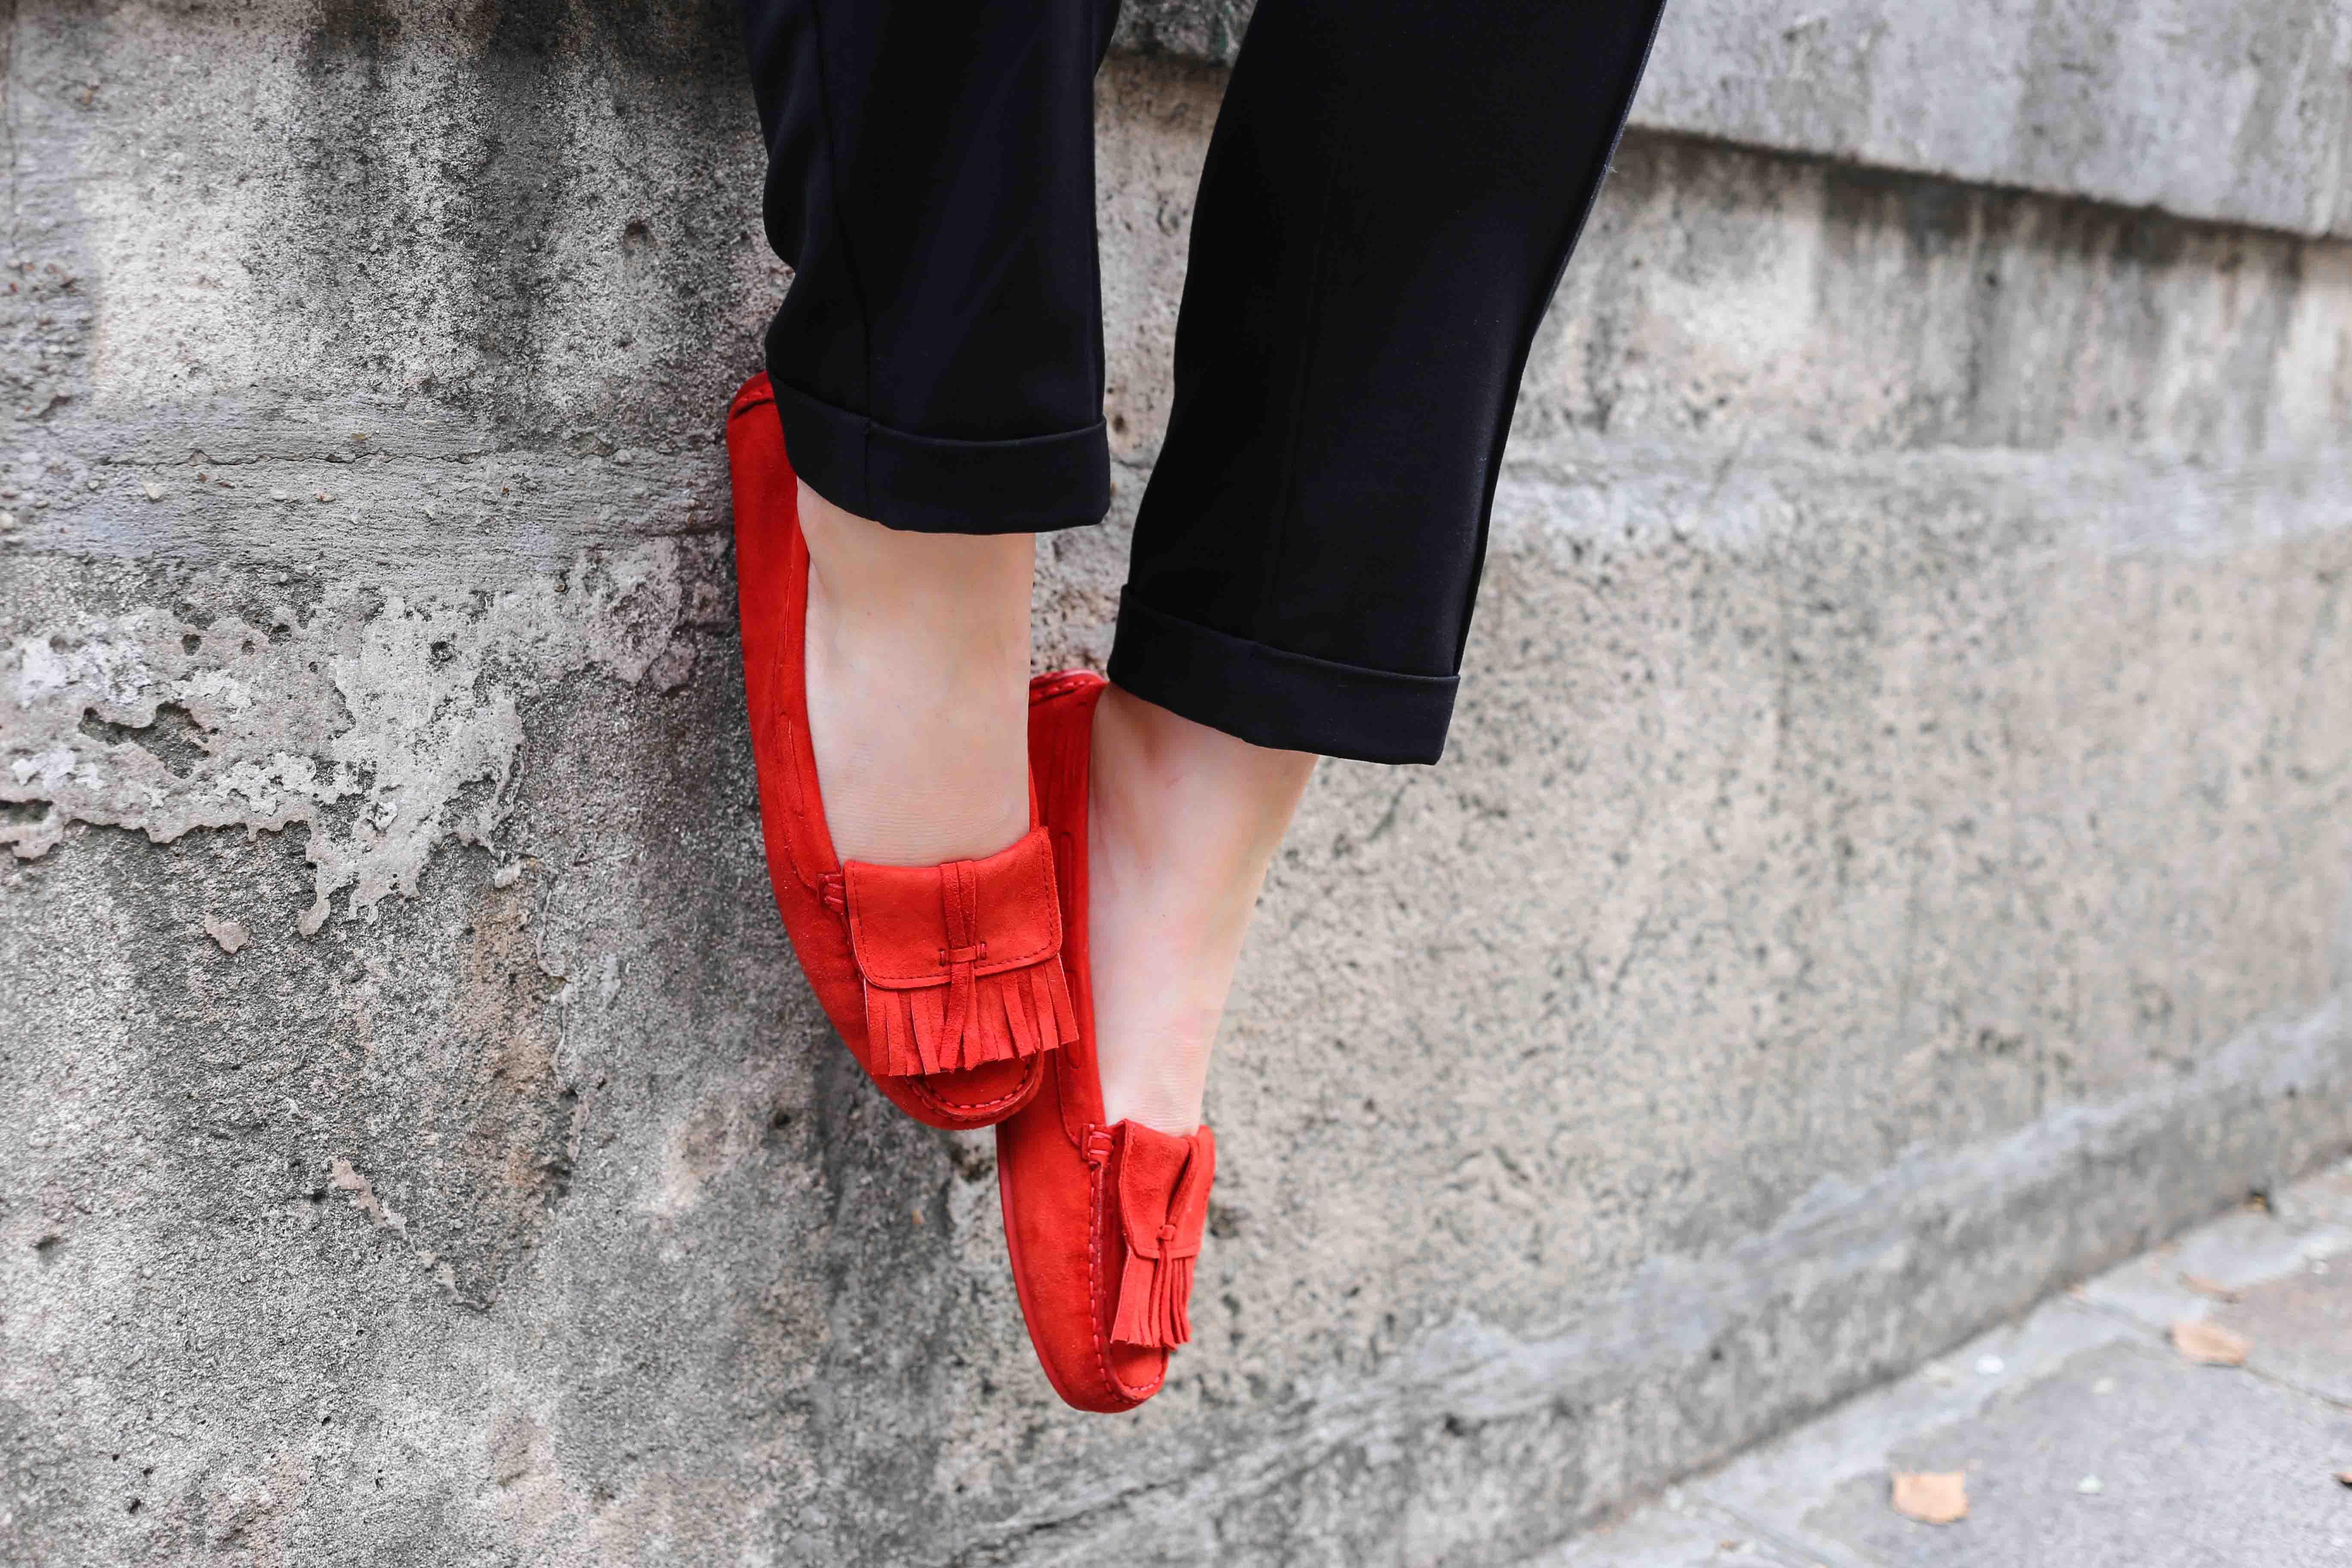 rote-mokassins-streifenbluse-weißer-blazer-paris-modeblog-fashionblog-fashion-blog_1463